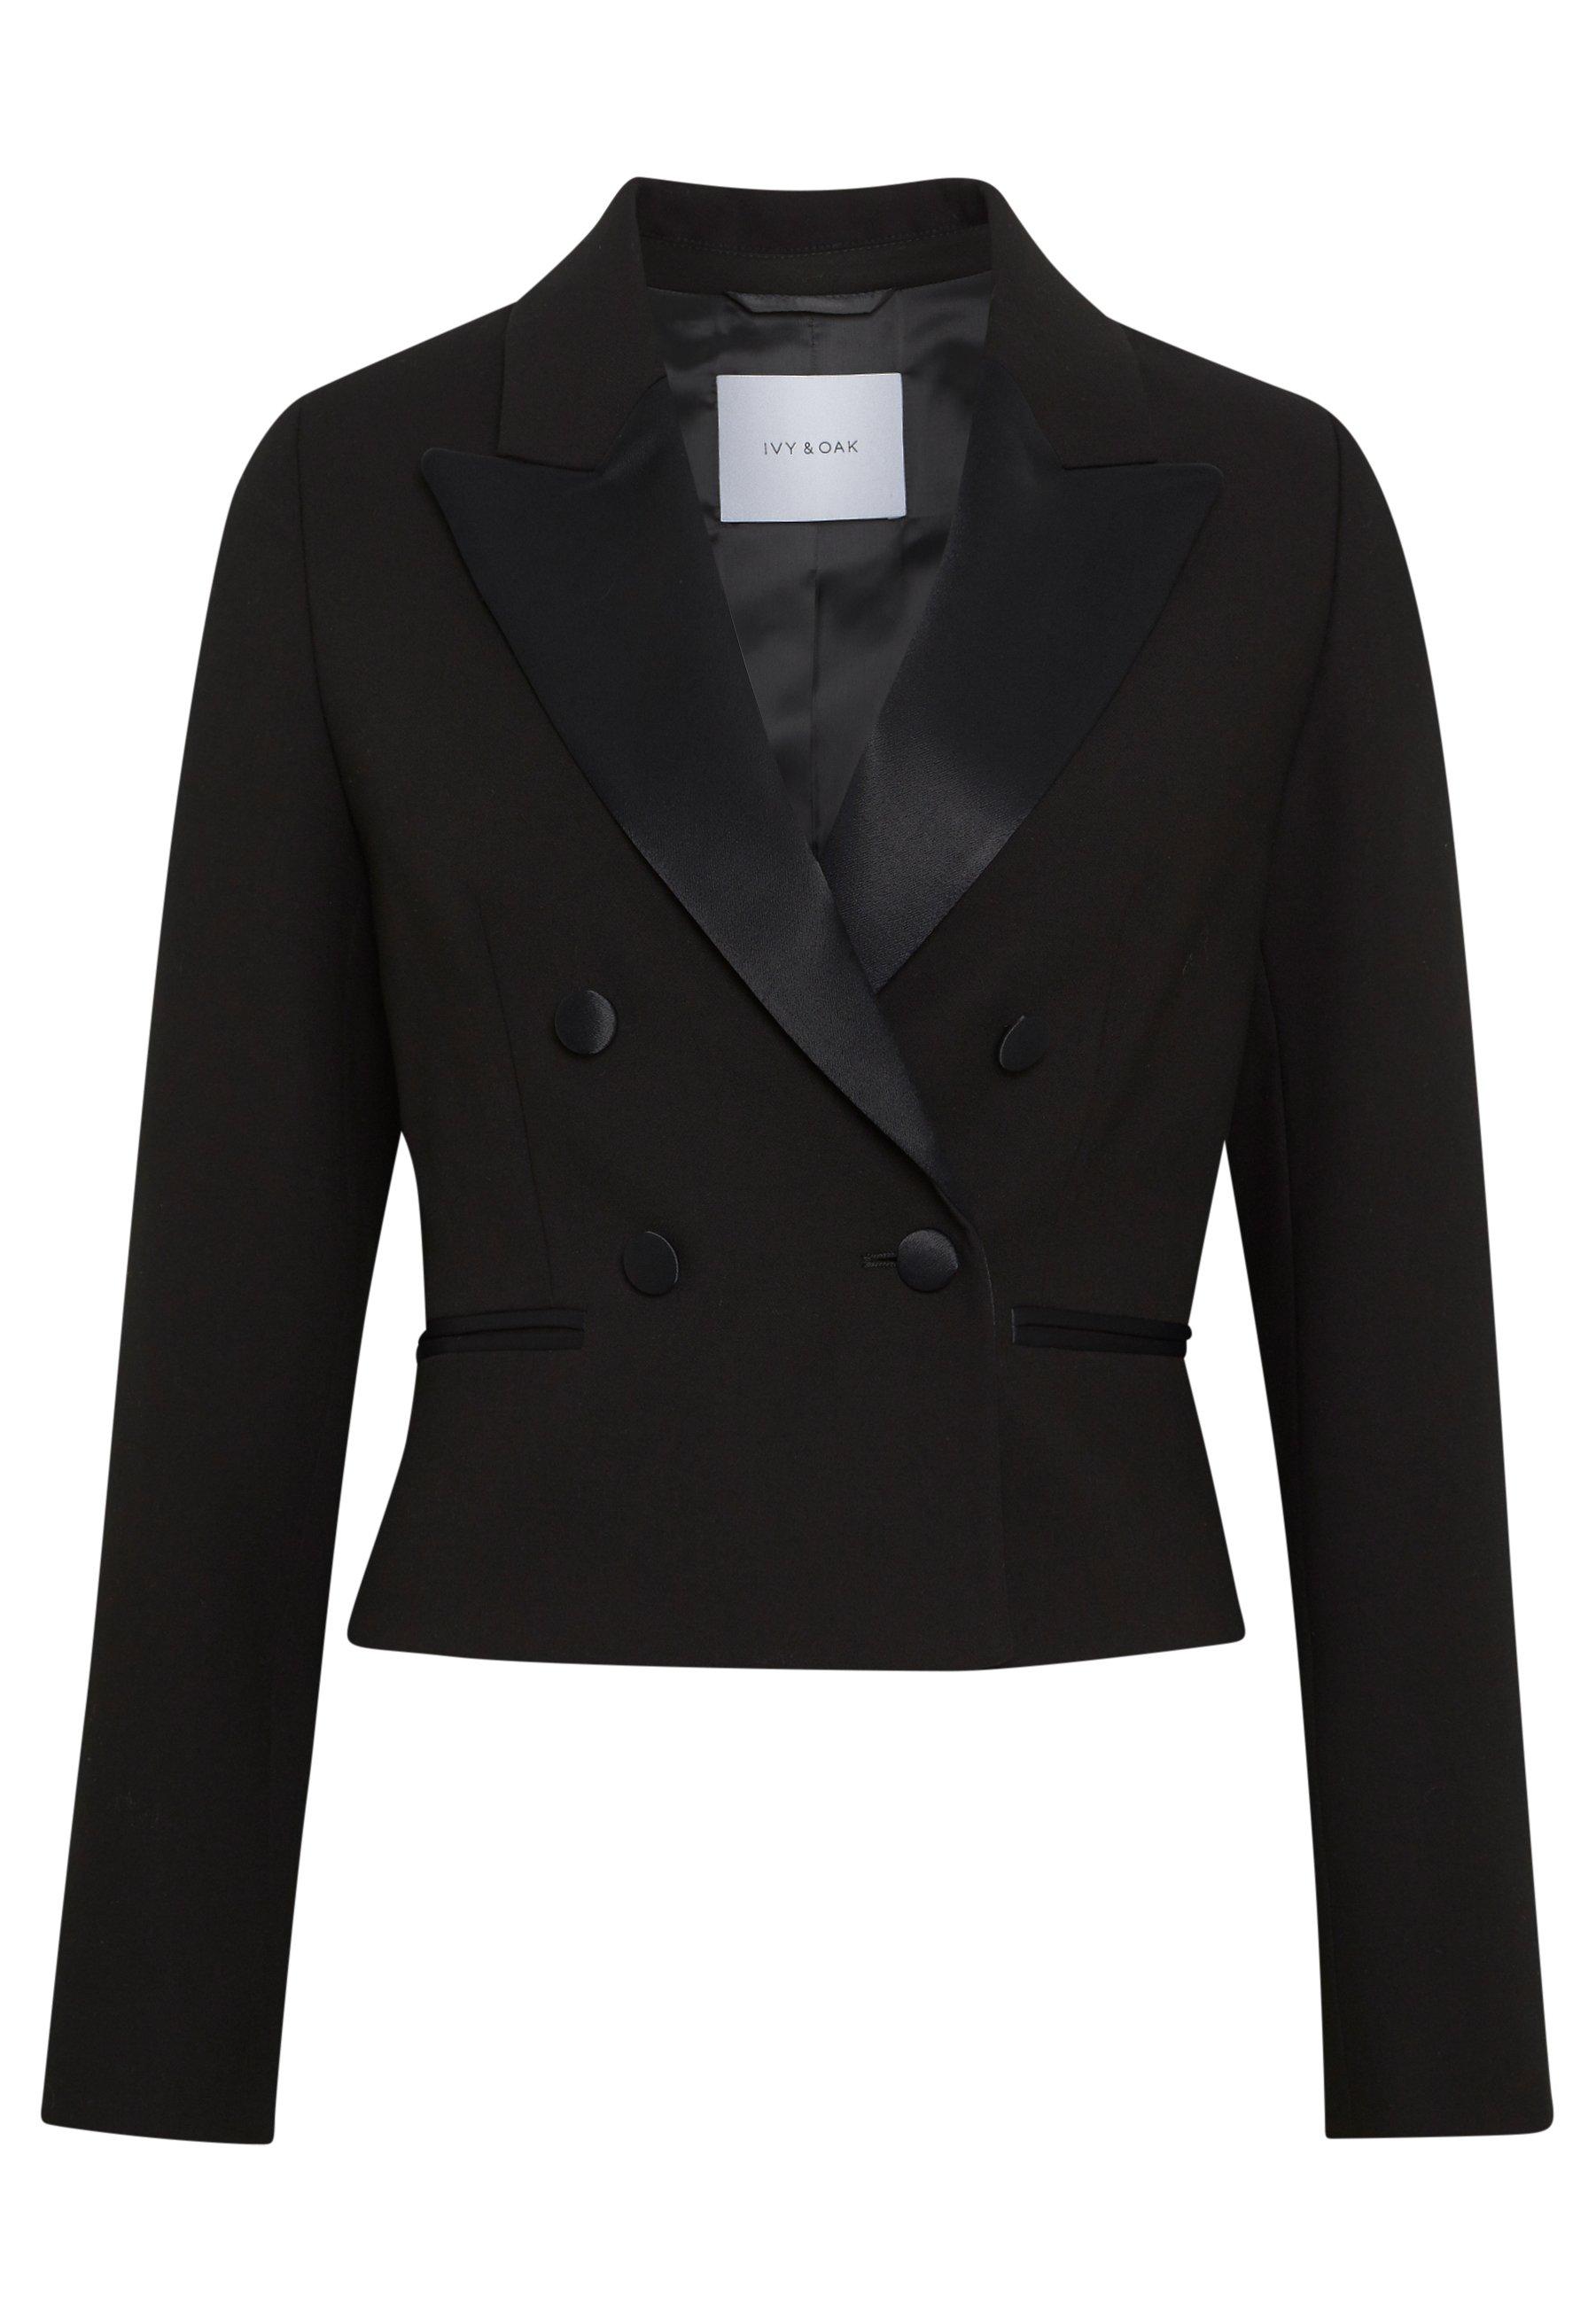 Ivy & Oak Cropped - Blazer Black UK